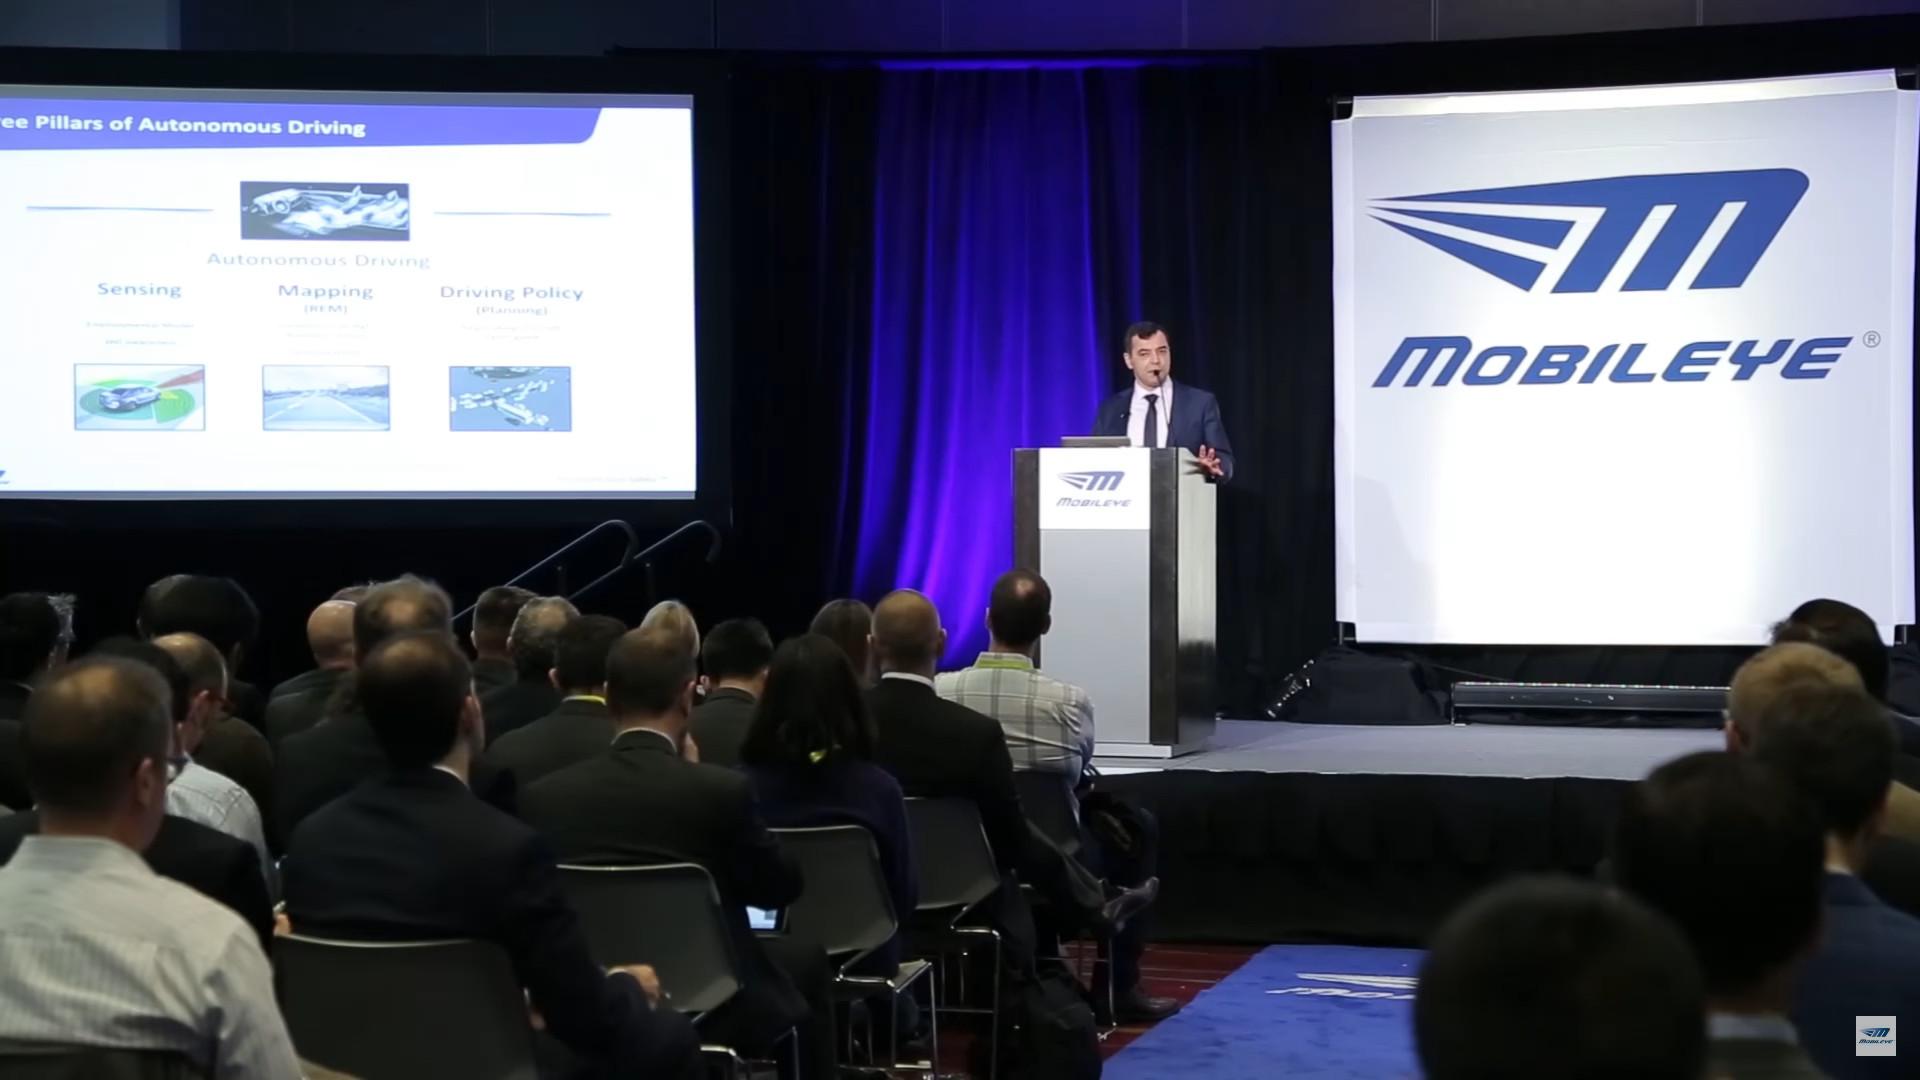 Mobileye executive giving a presentation at a conference.